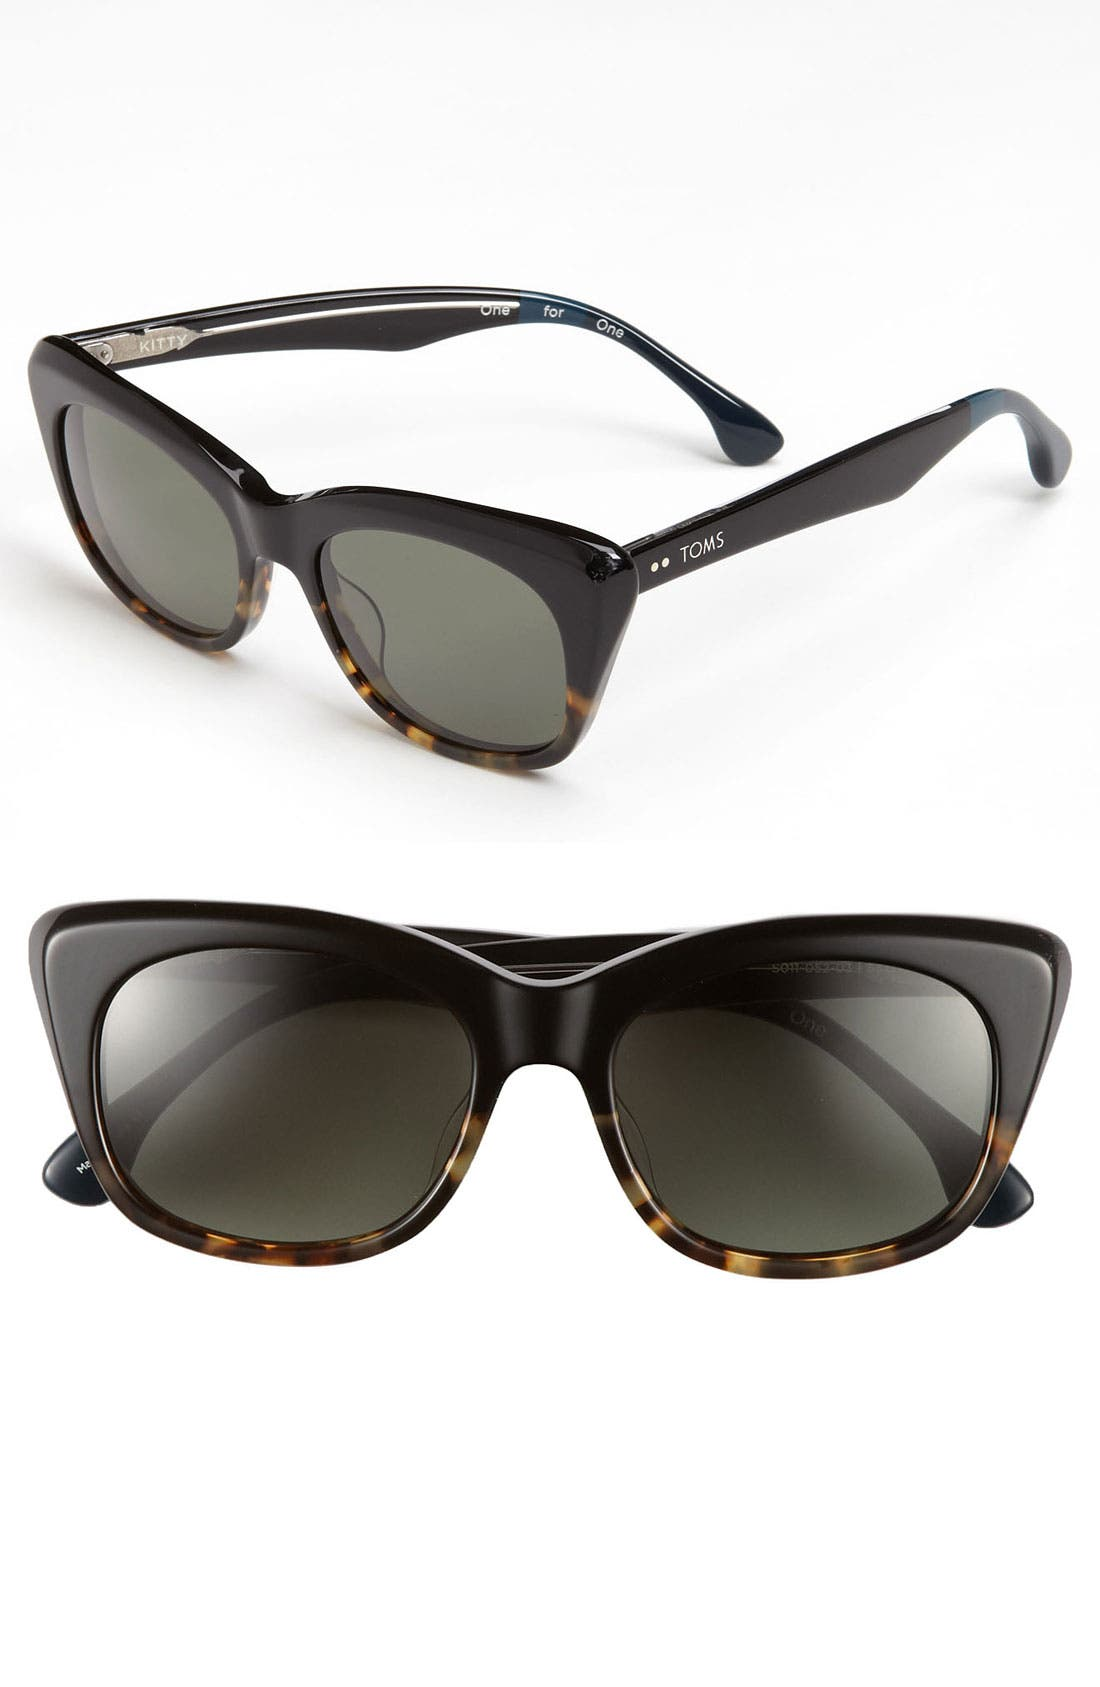 Main Image - TOMS 'Kitty' 53mm Sunglasses